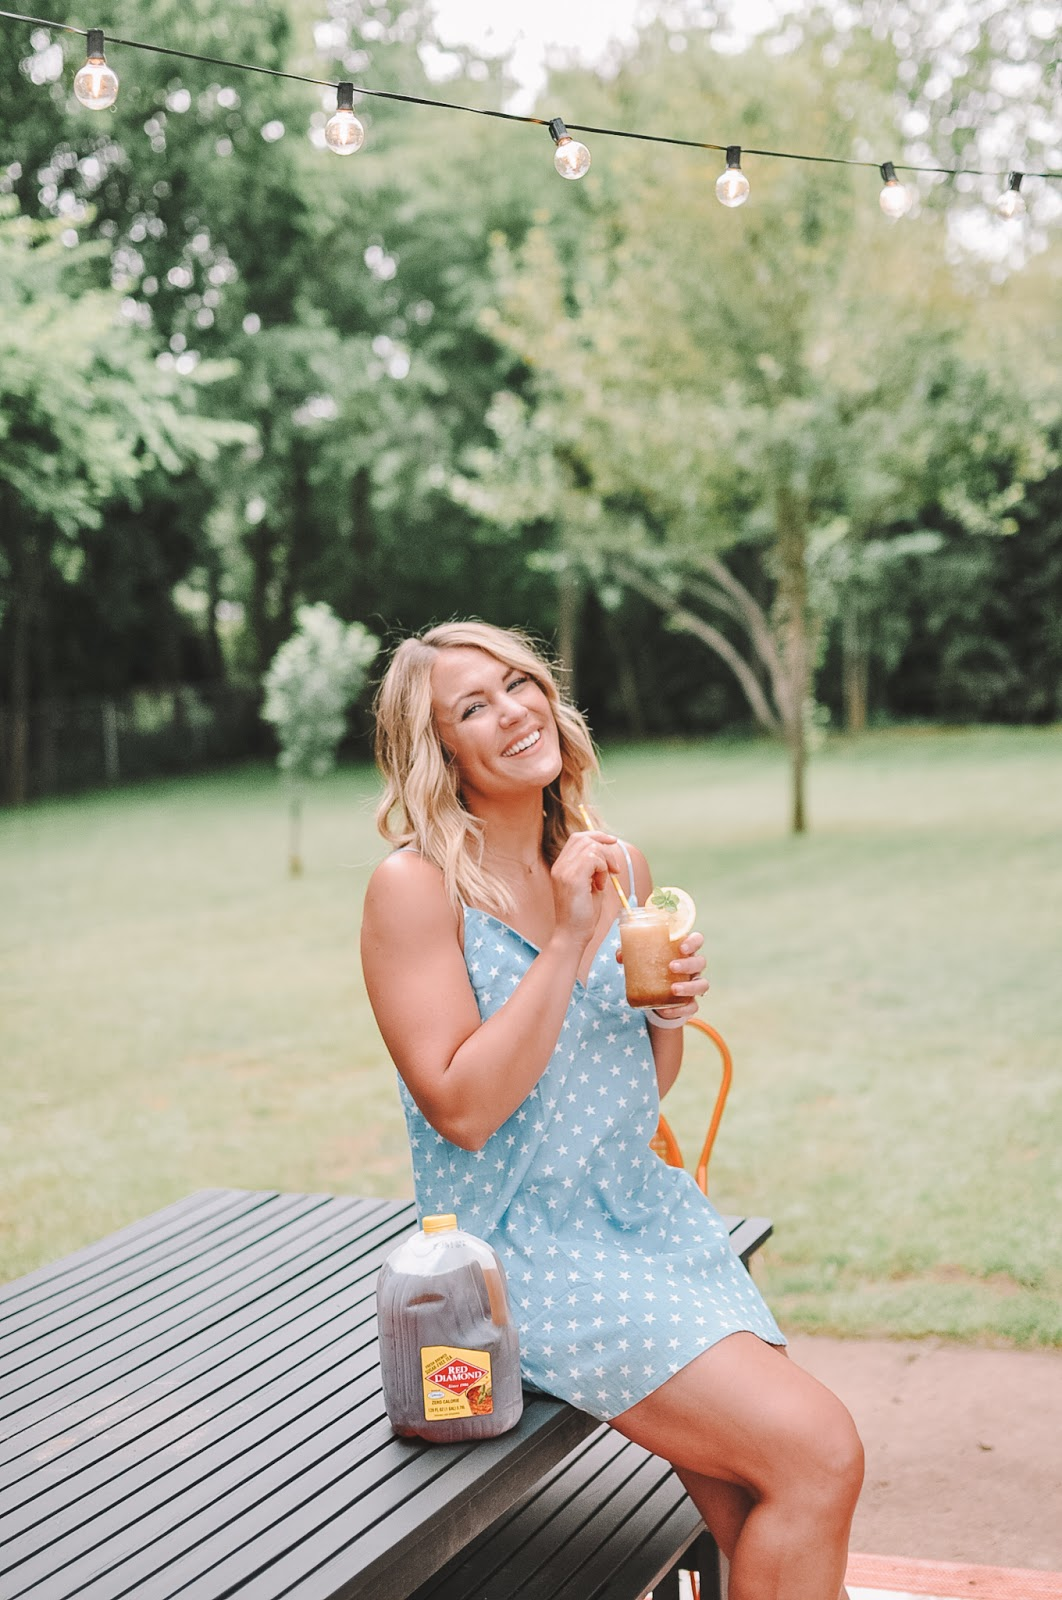 blogger Amanda Martin of OKC blog Amanda's OK enjoying an Okie Sweet Tea Slush cocktail made with Red Diamond Iced Tea